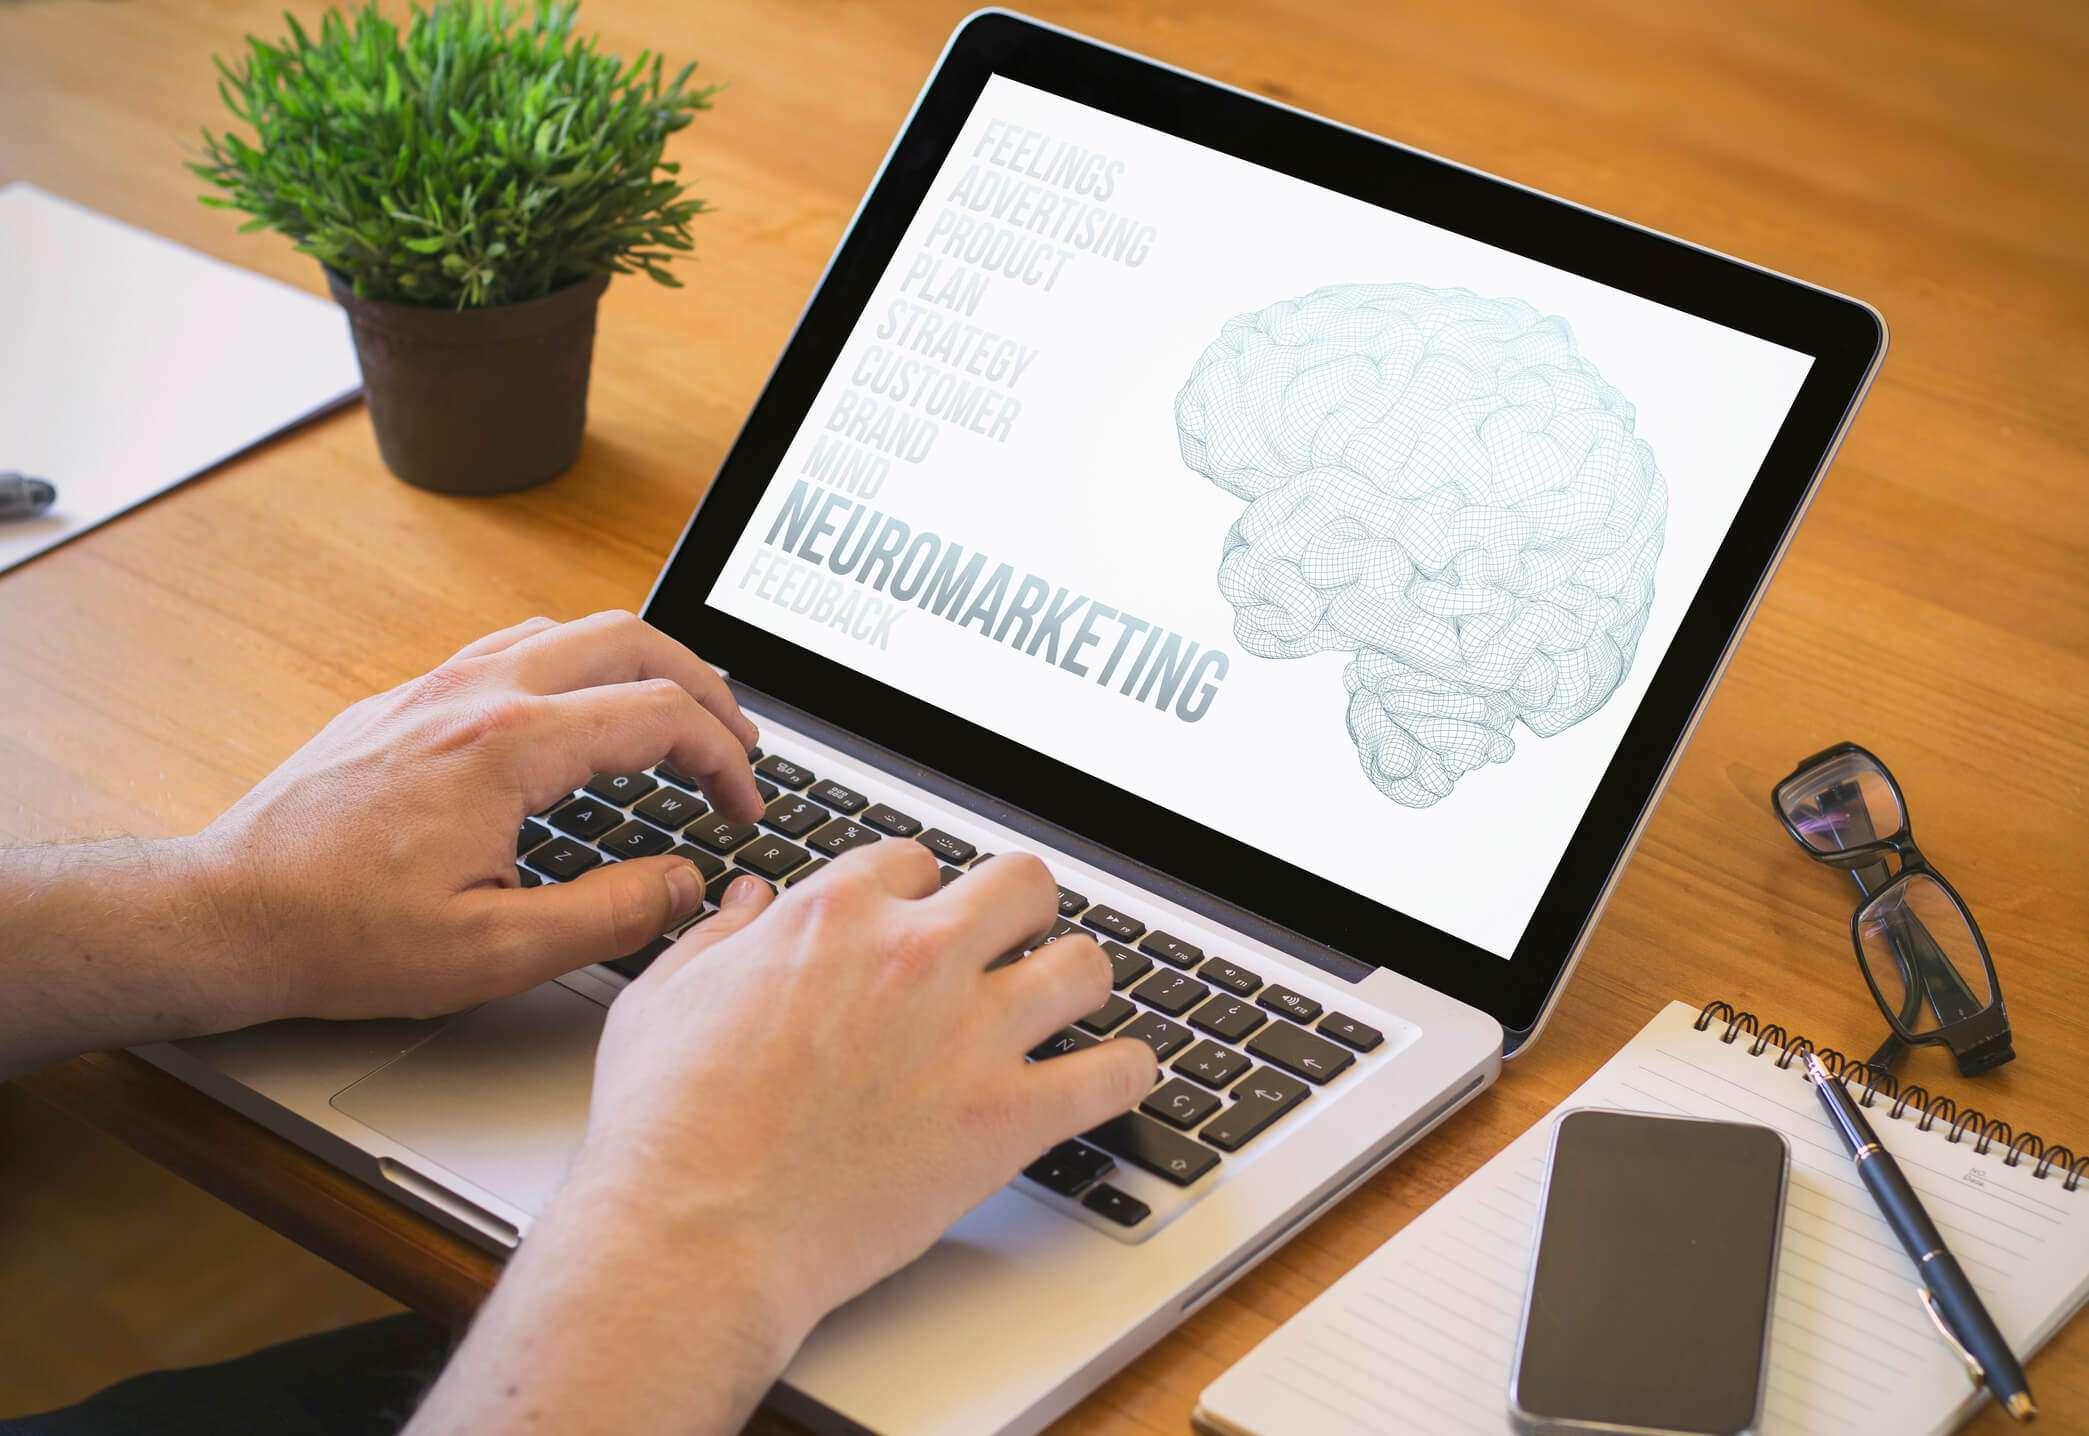 Como O Neuromarketing Pode Ajudar O Seu Negocio.jpeg